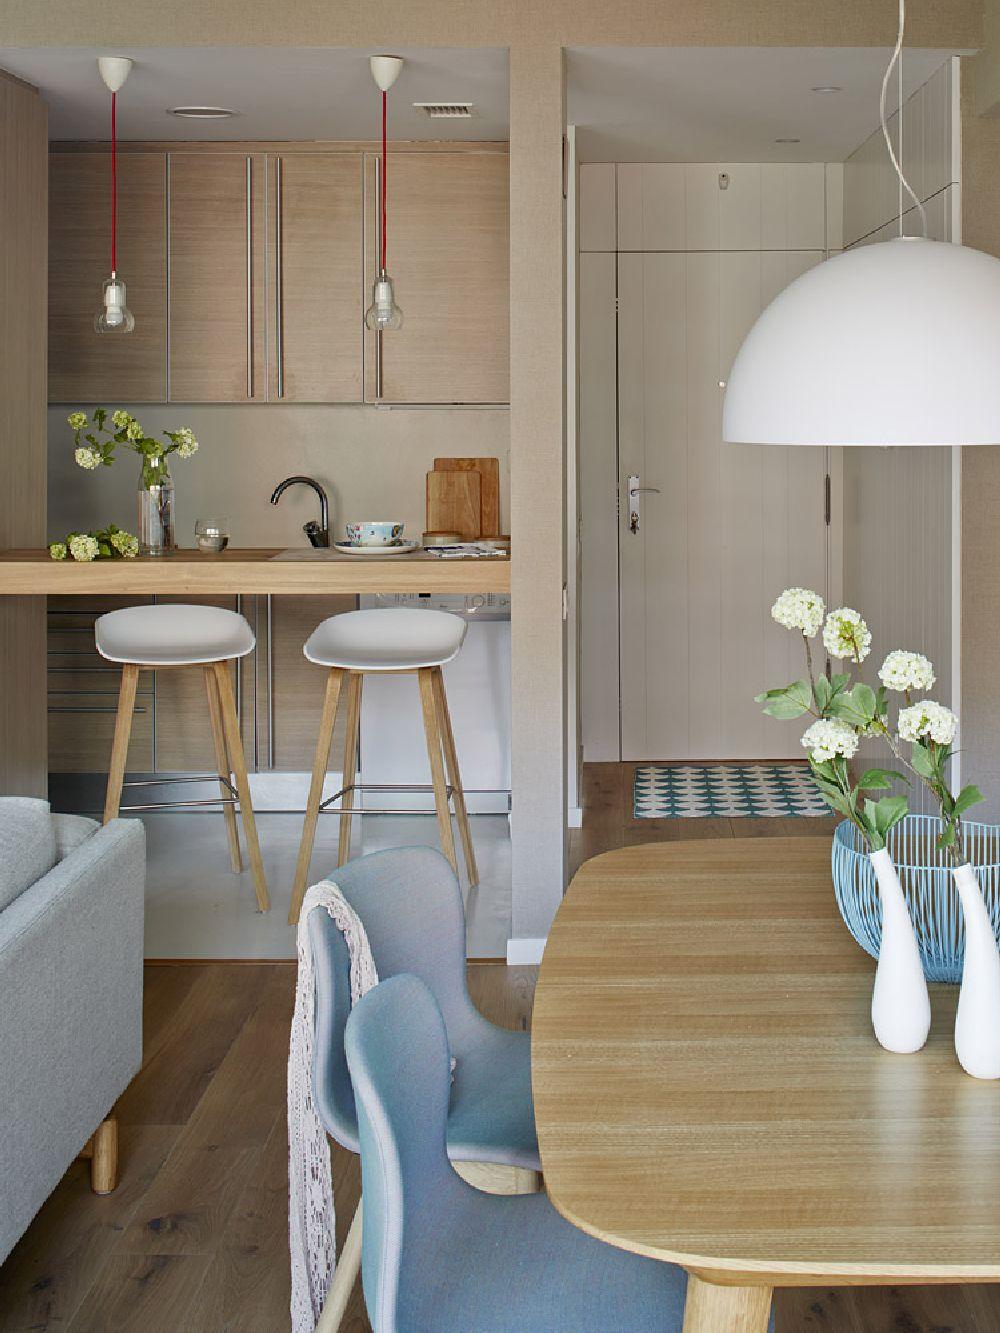 adelaparvu.com despre apartament cu aer mediteranean, design interior Meritxell Ribe (8)